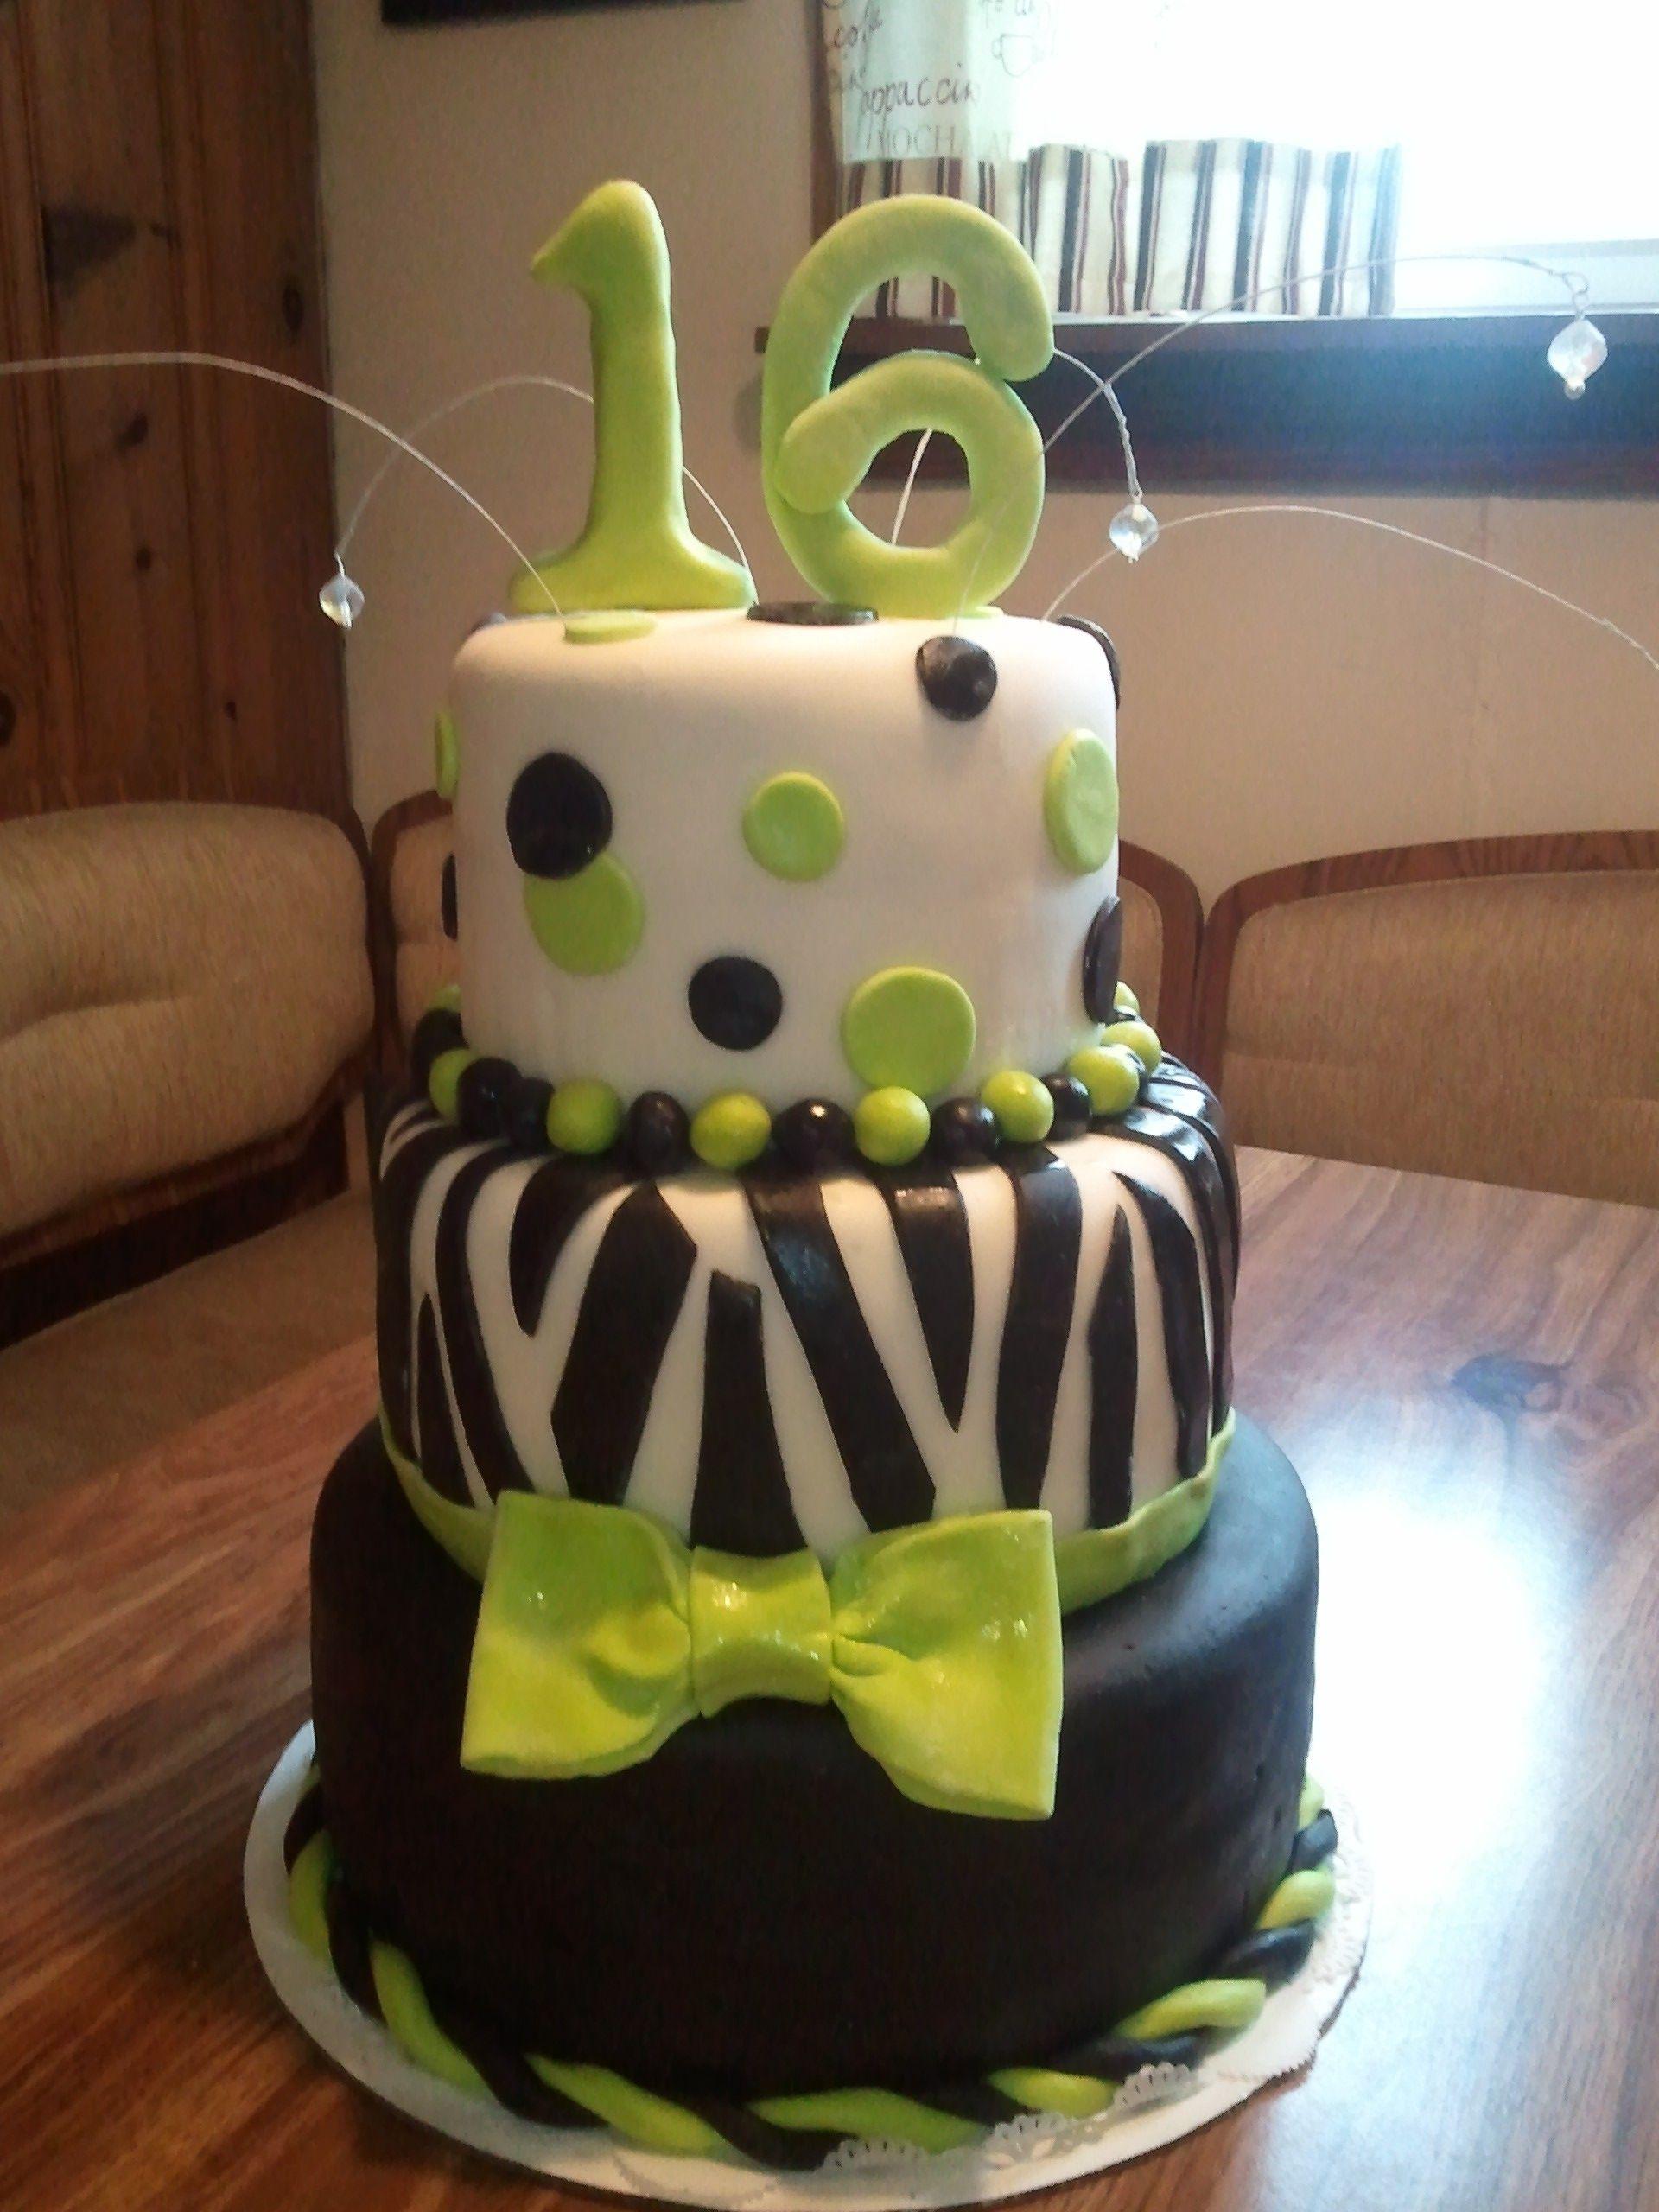 16 th birthday cakes